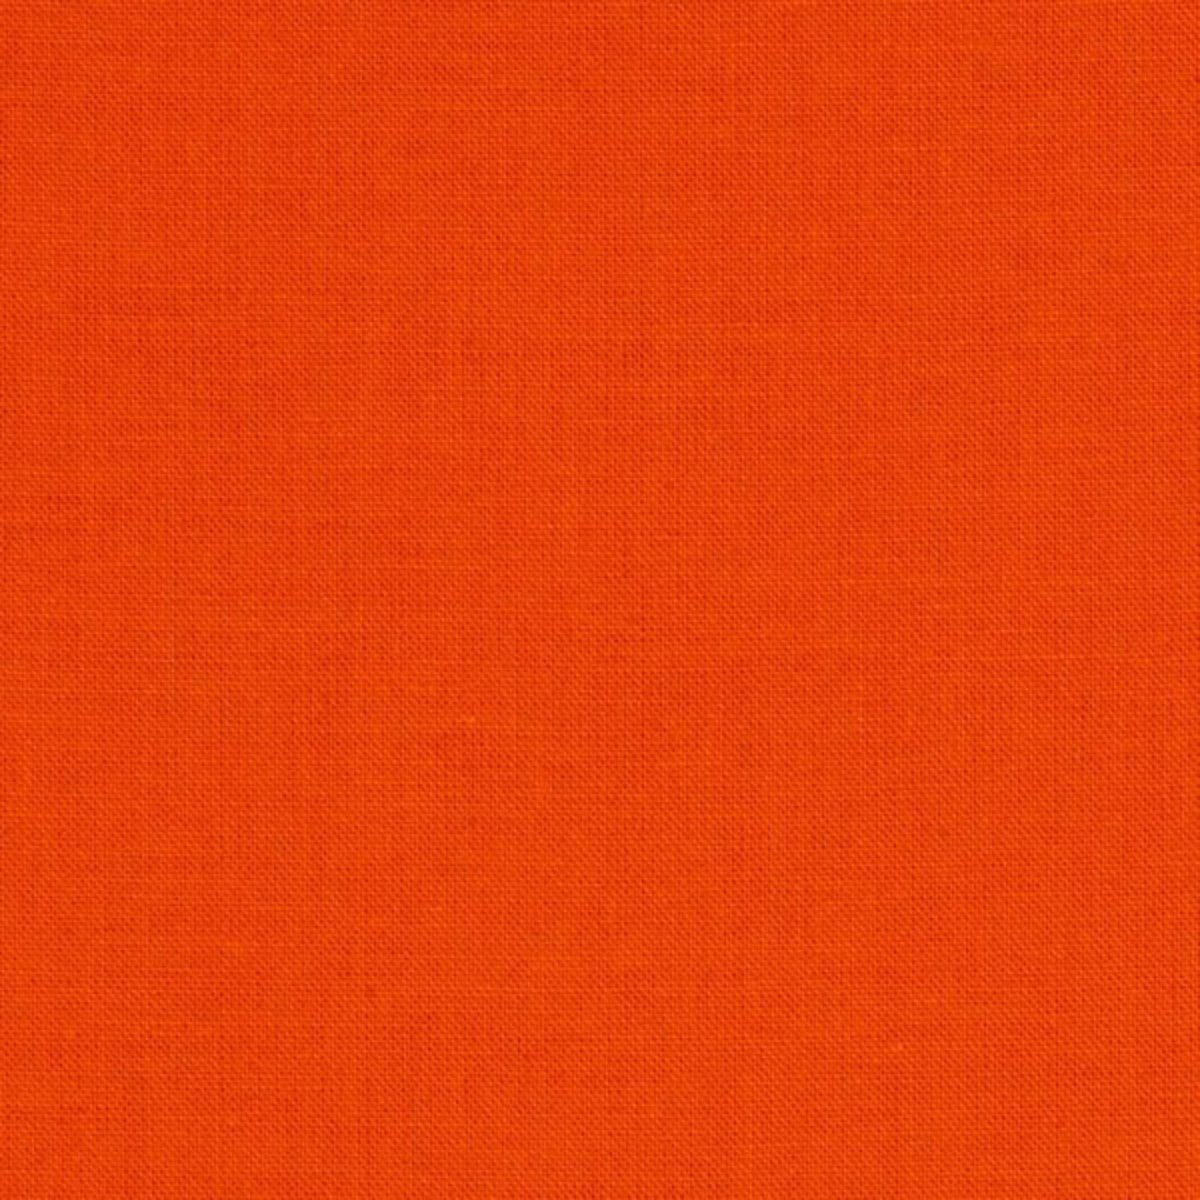 Kona Cotton - Carrot (400)